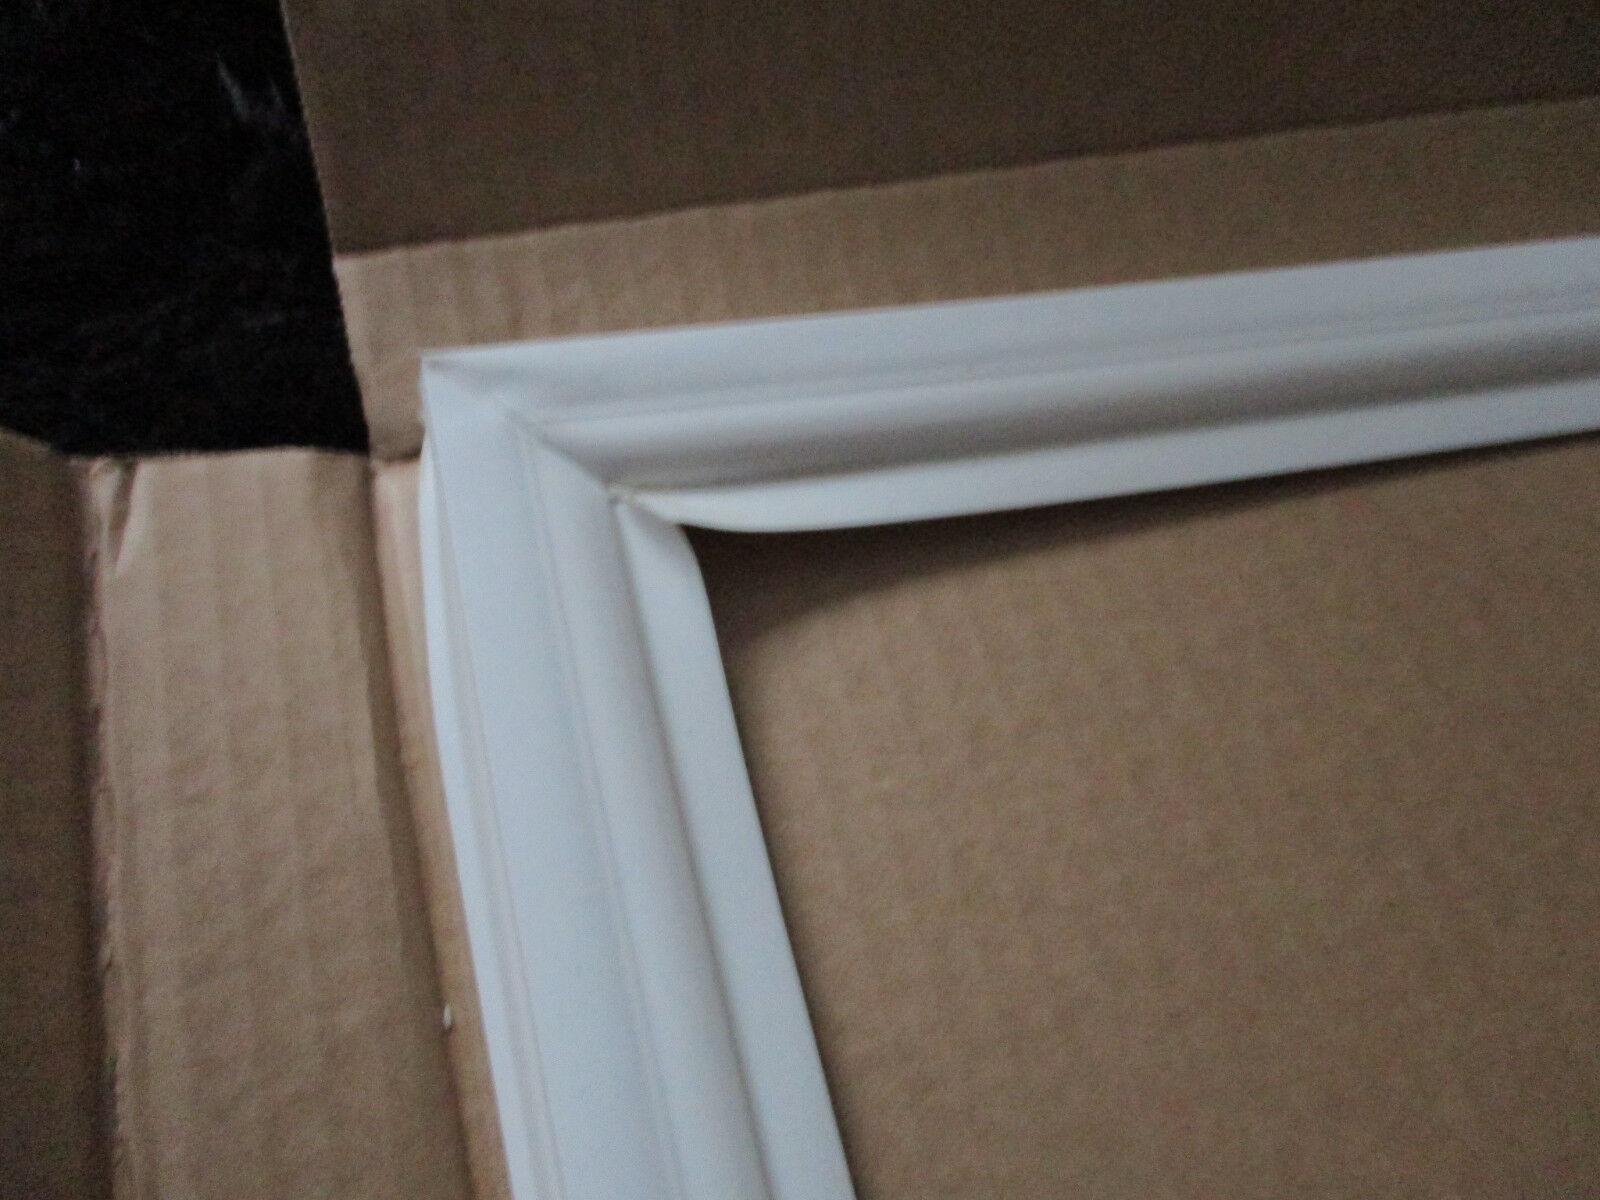 Bomann Kühlschrank Dichtung : Bomann kühlschrank dichtung rabatt preisvergleich weiße ware u e